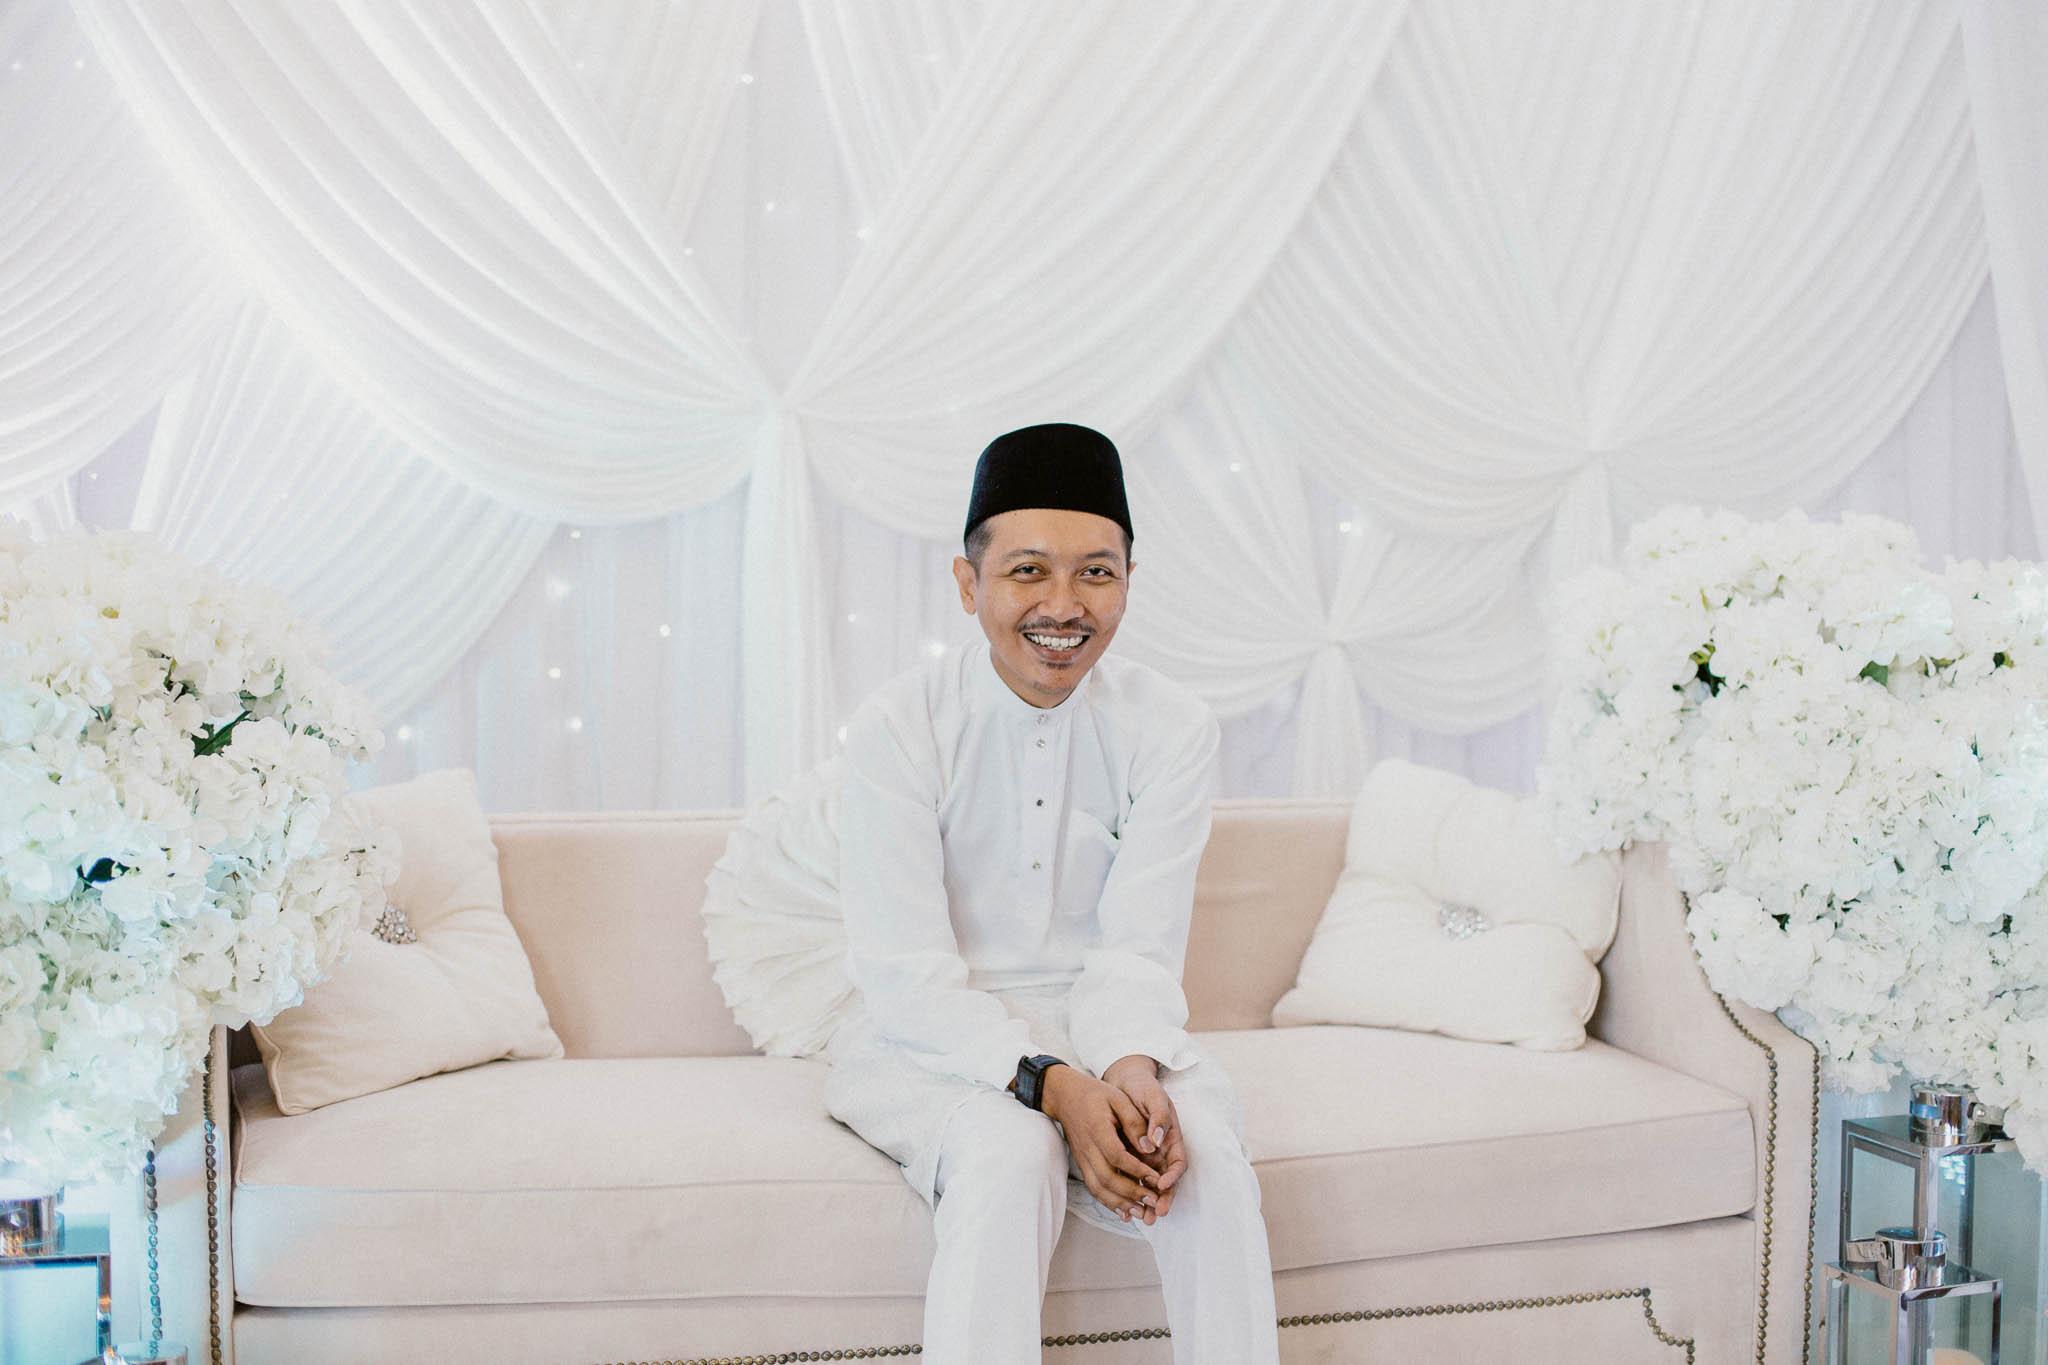 singapore-wedding-photographer-wedding-nufail-addafiq-034.jpg